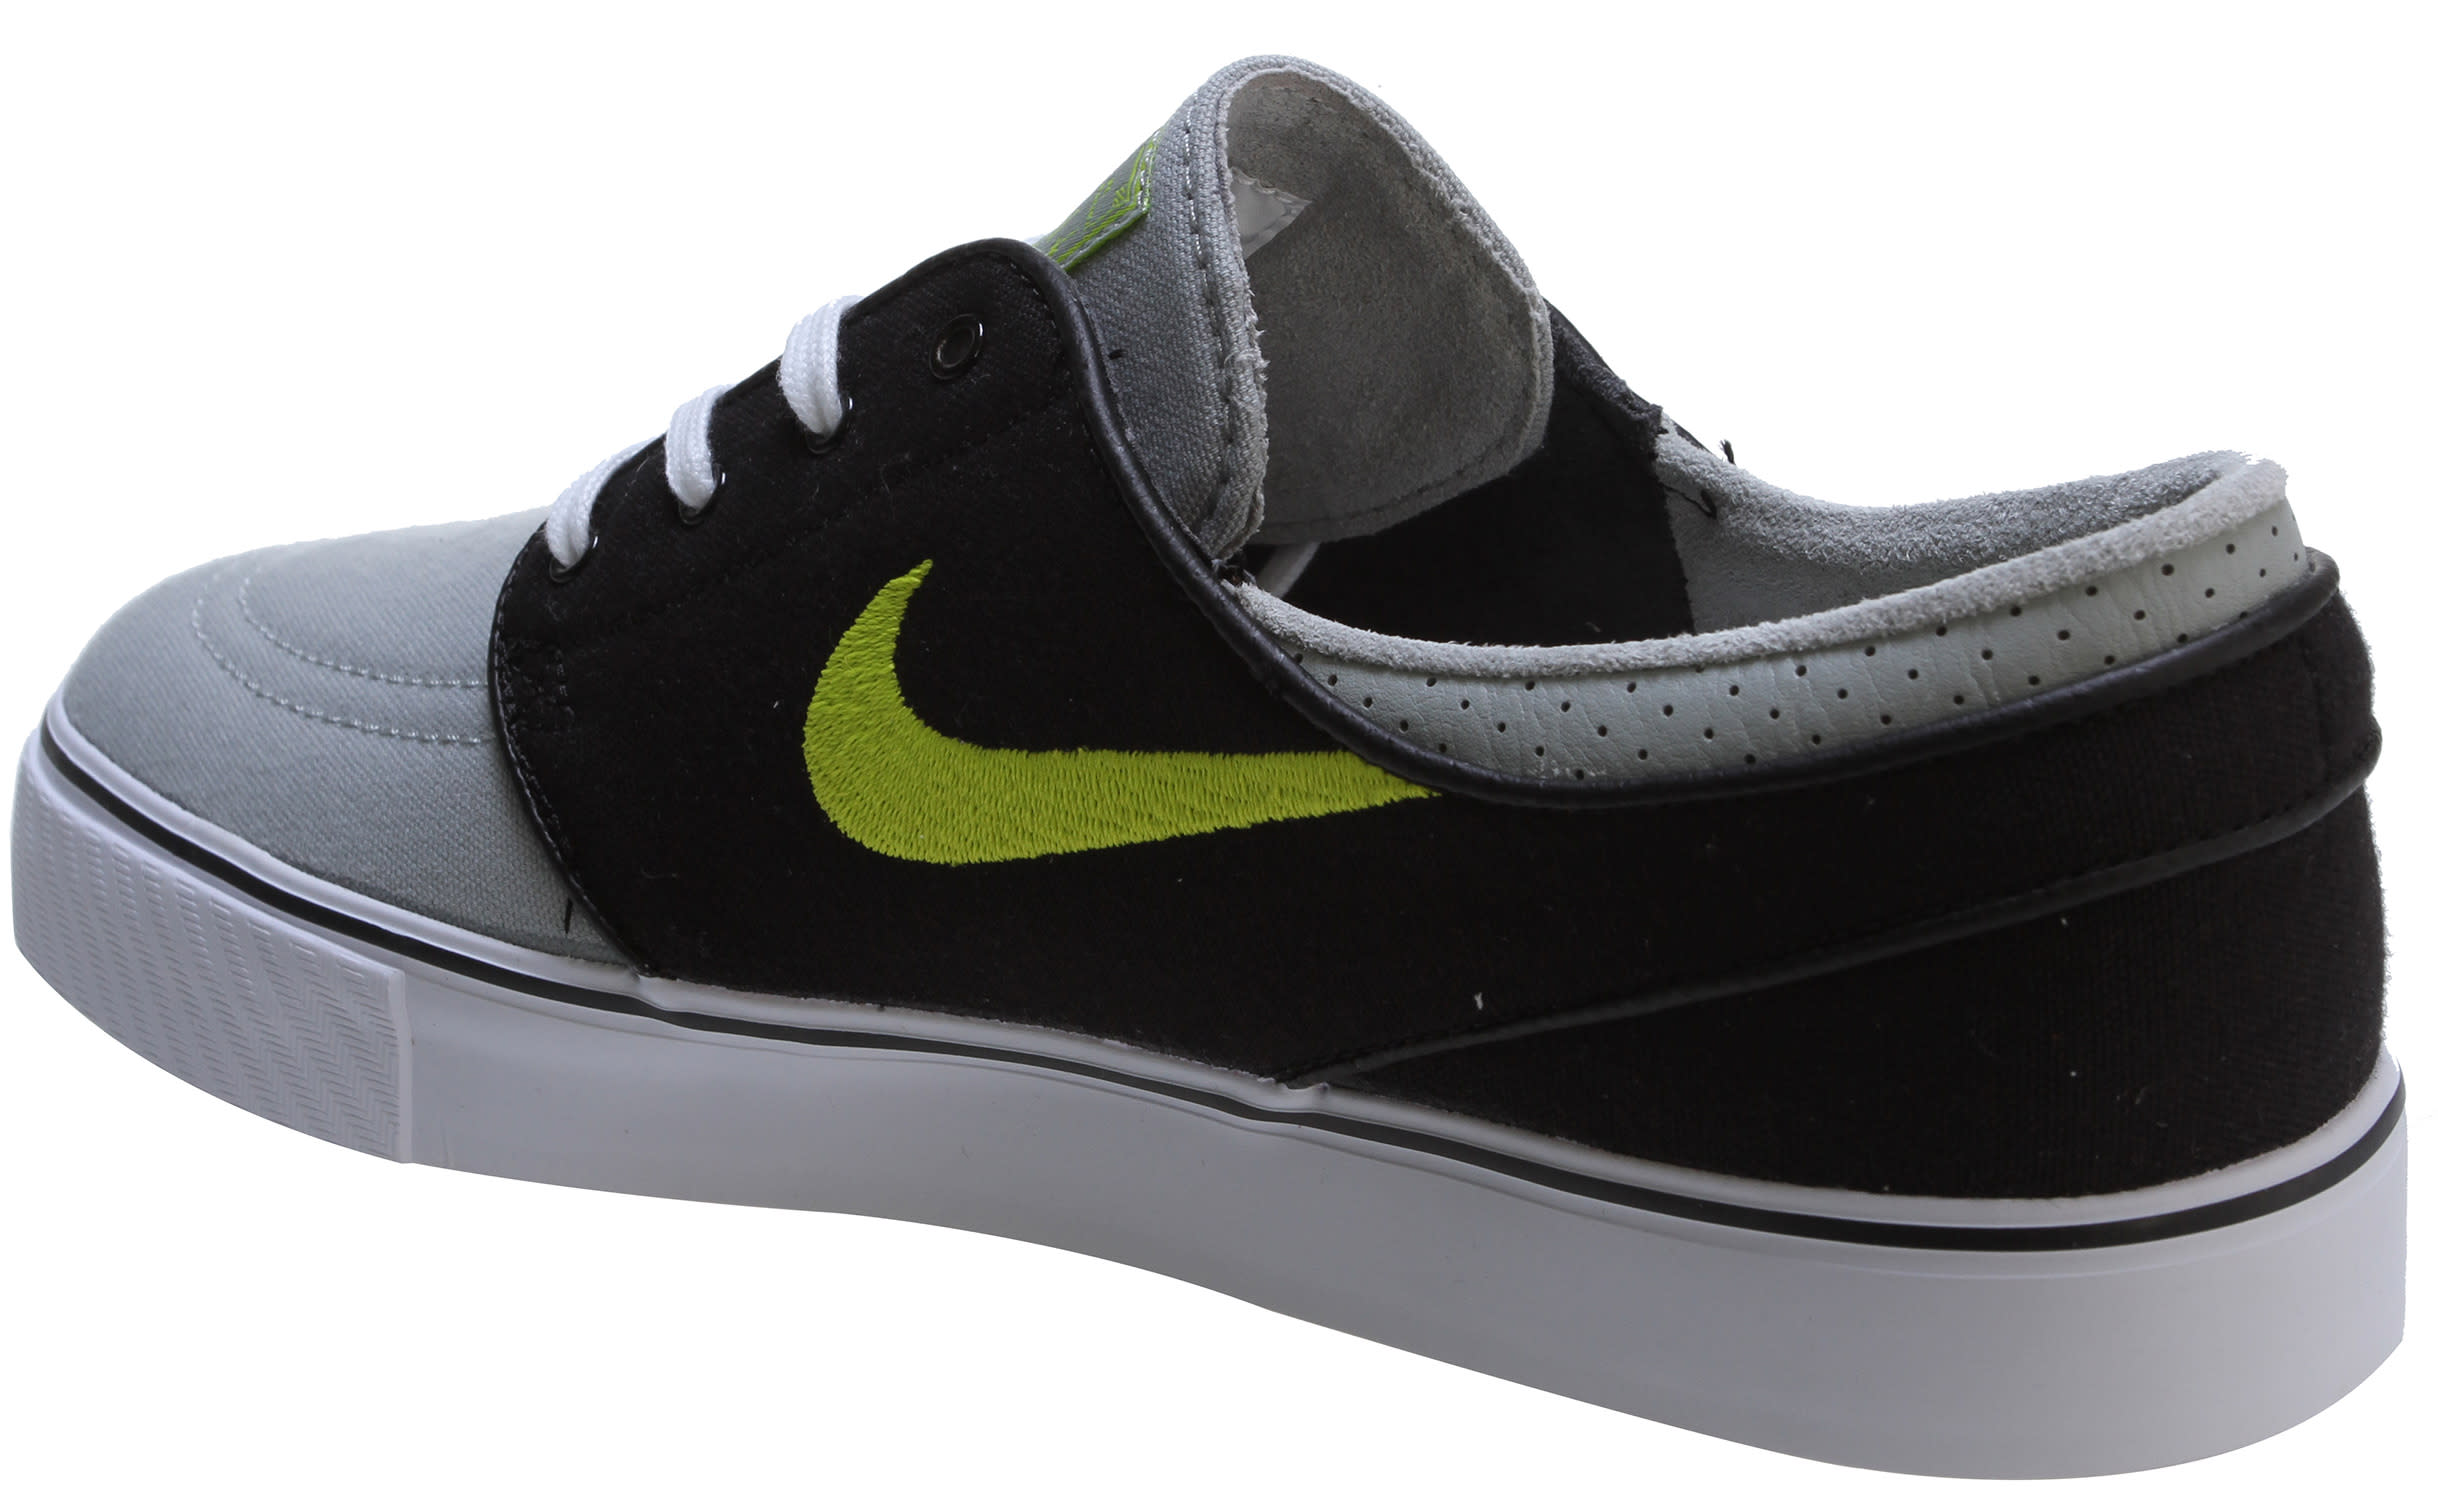 6d7c88641192 Nike Zoom Stefan Janoski Canvas Skate Shoes - thumbnail 3